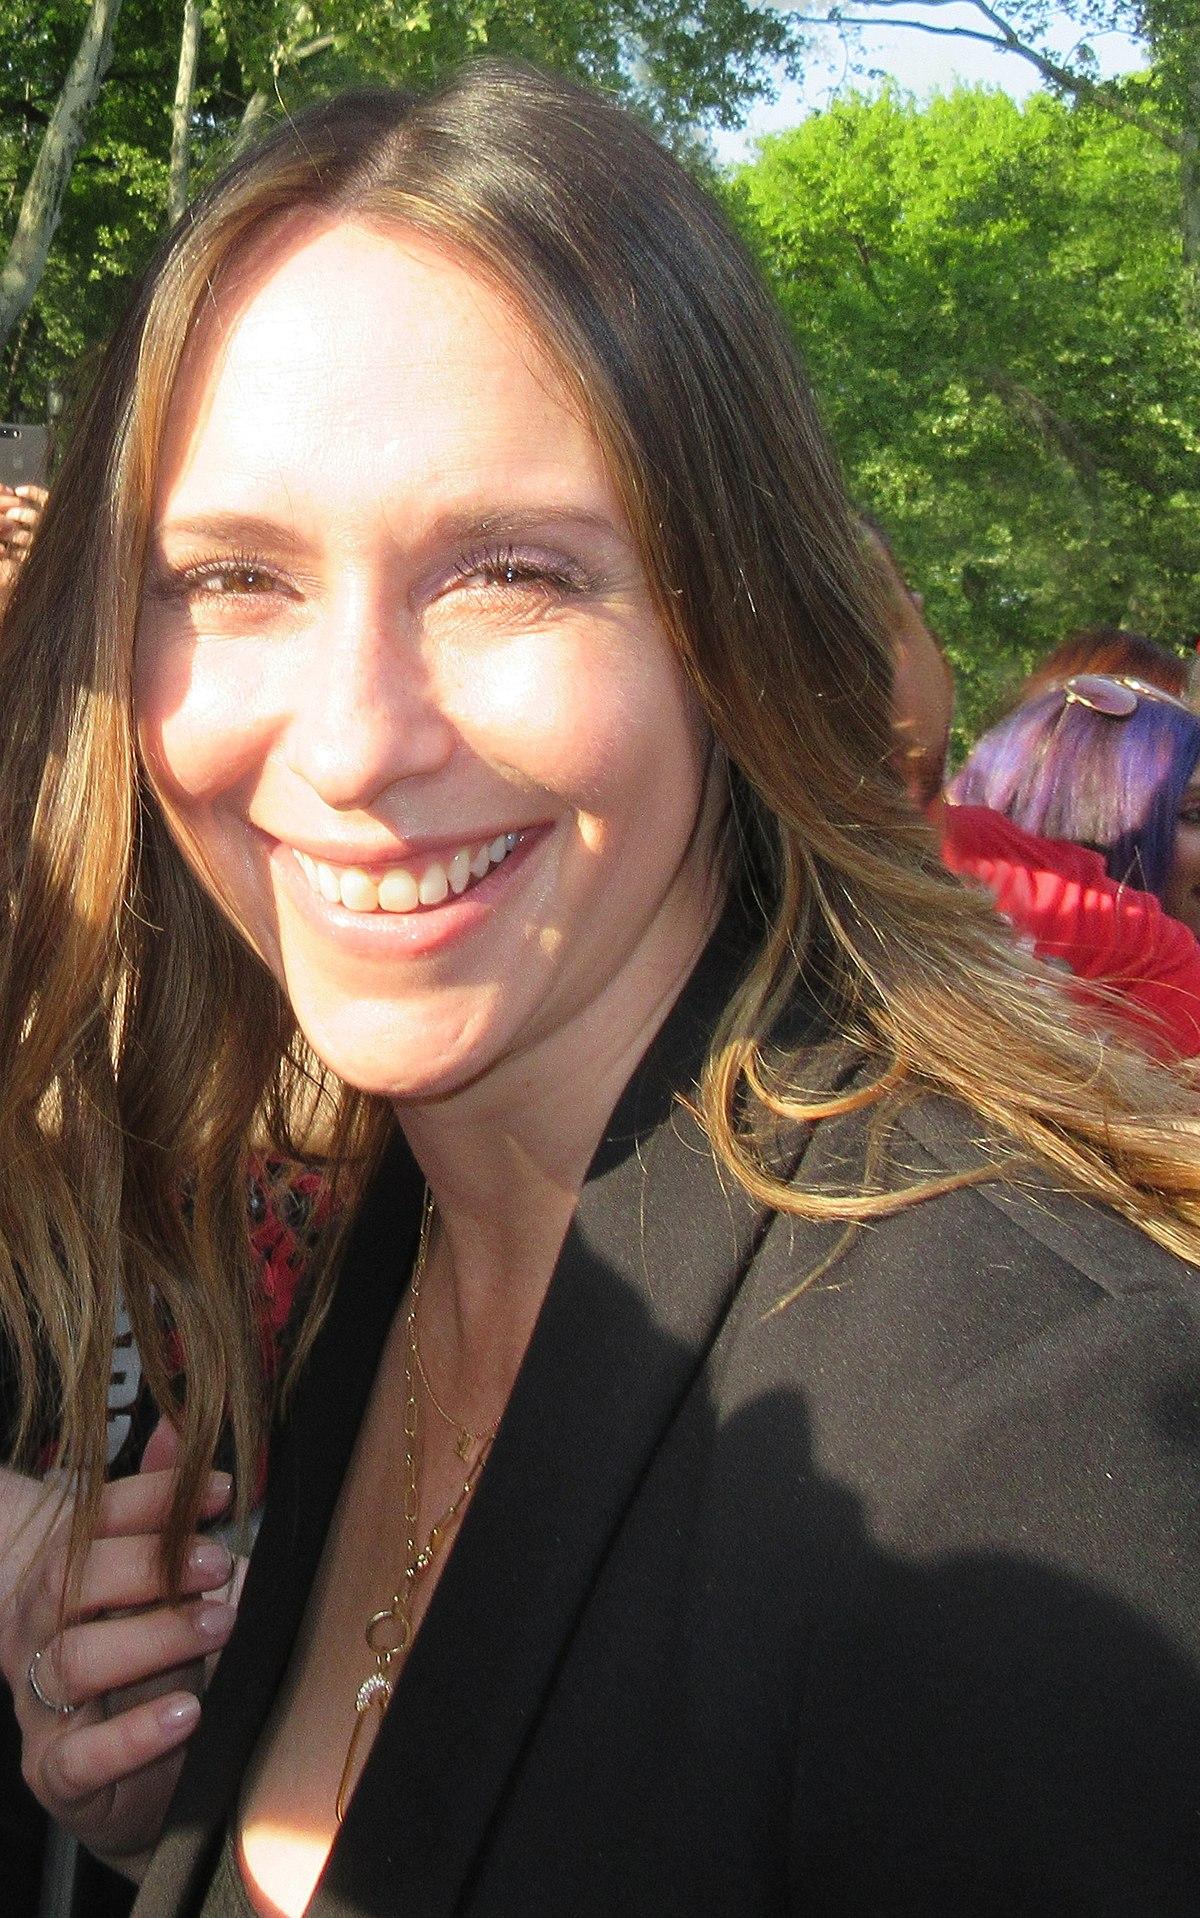 Jennifer Love Hewitt – Wikipédia, a enciclopédia livre